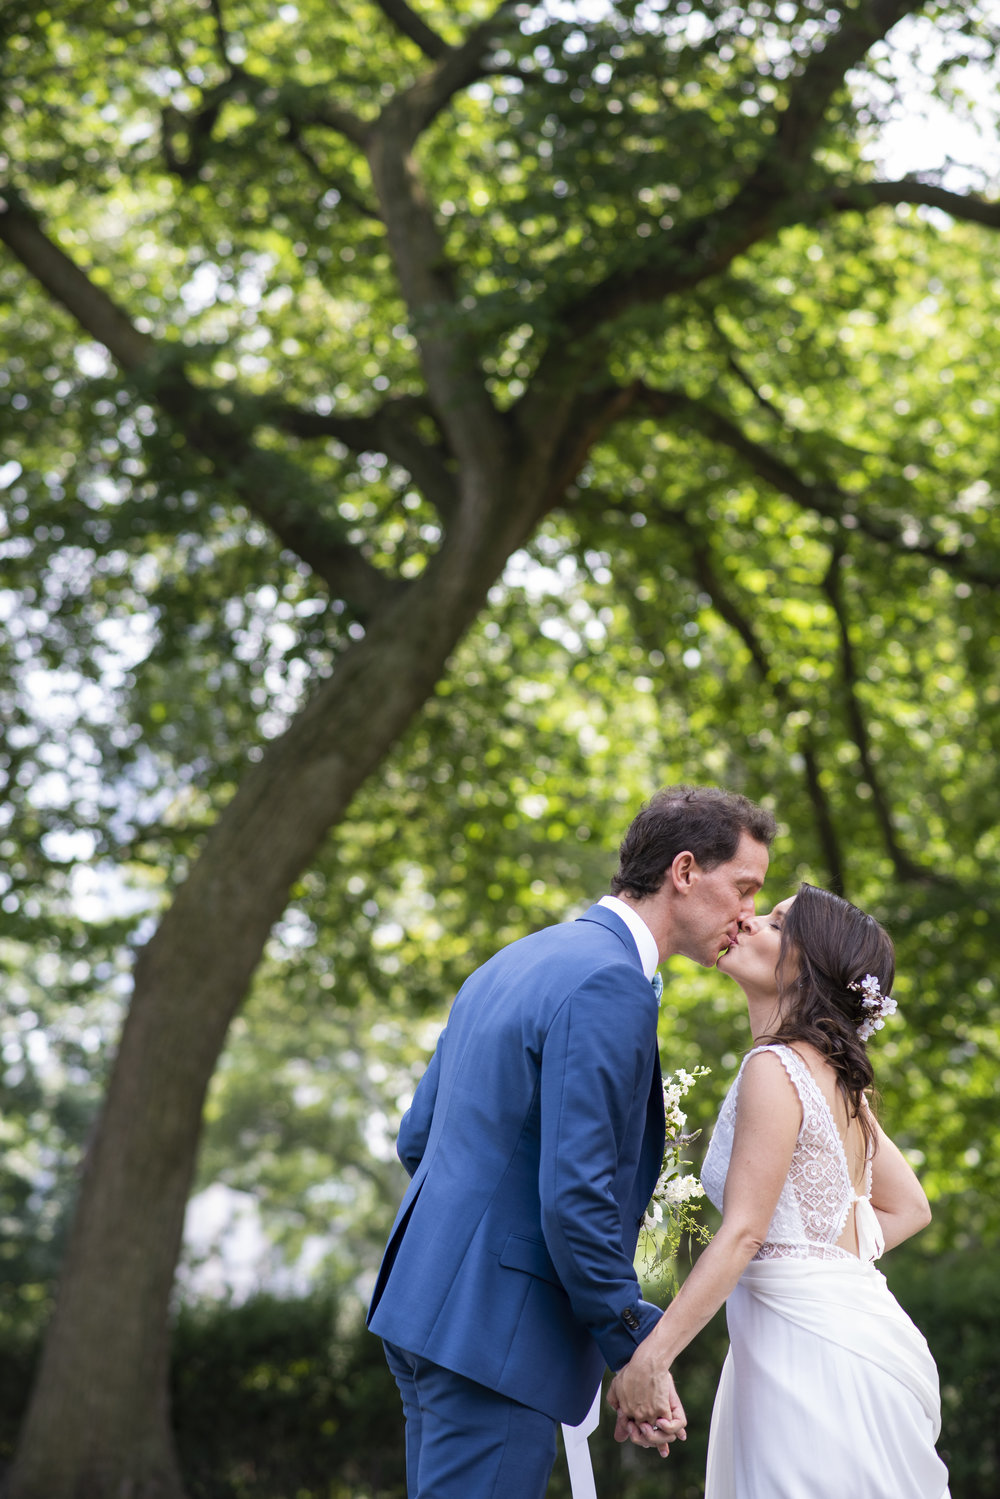 Keren & Jonathan's Wedding by Romina Hendlin-214.jpg